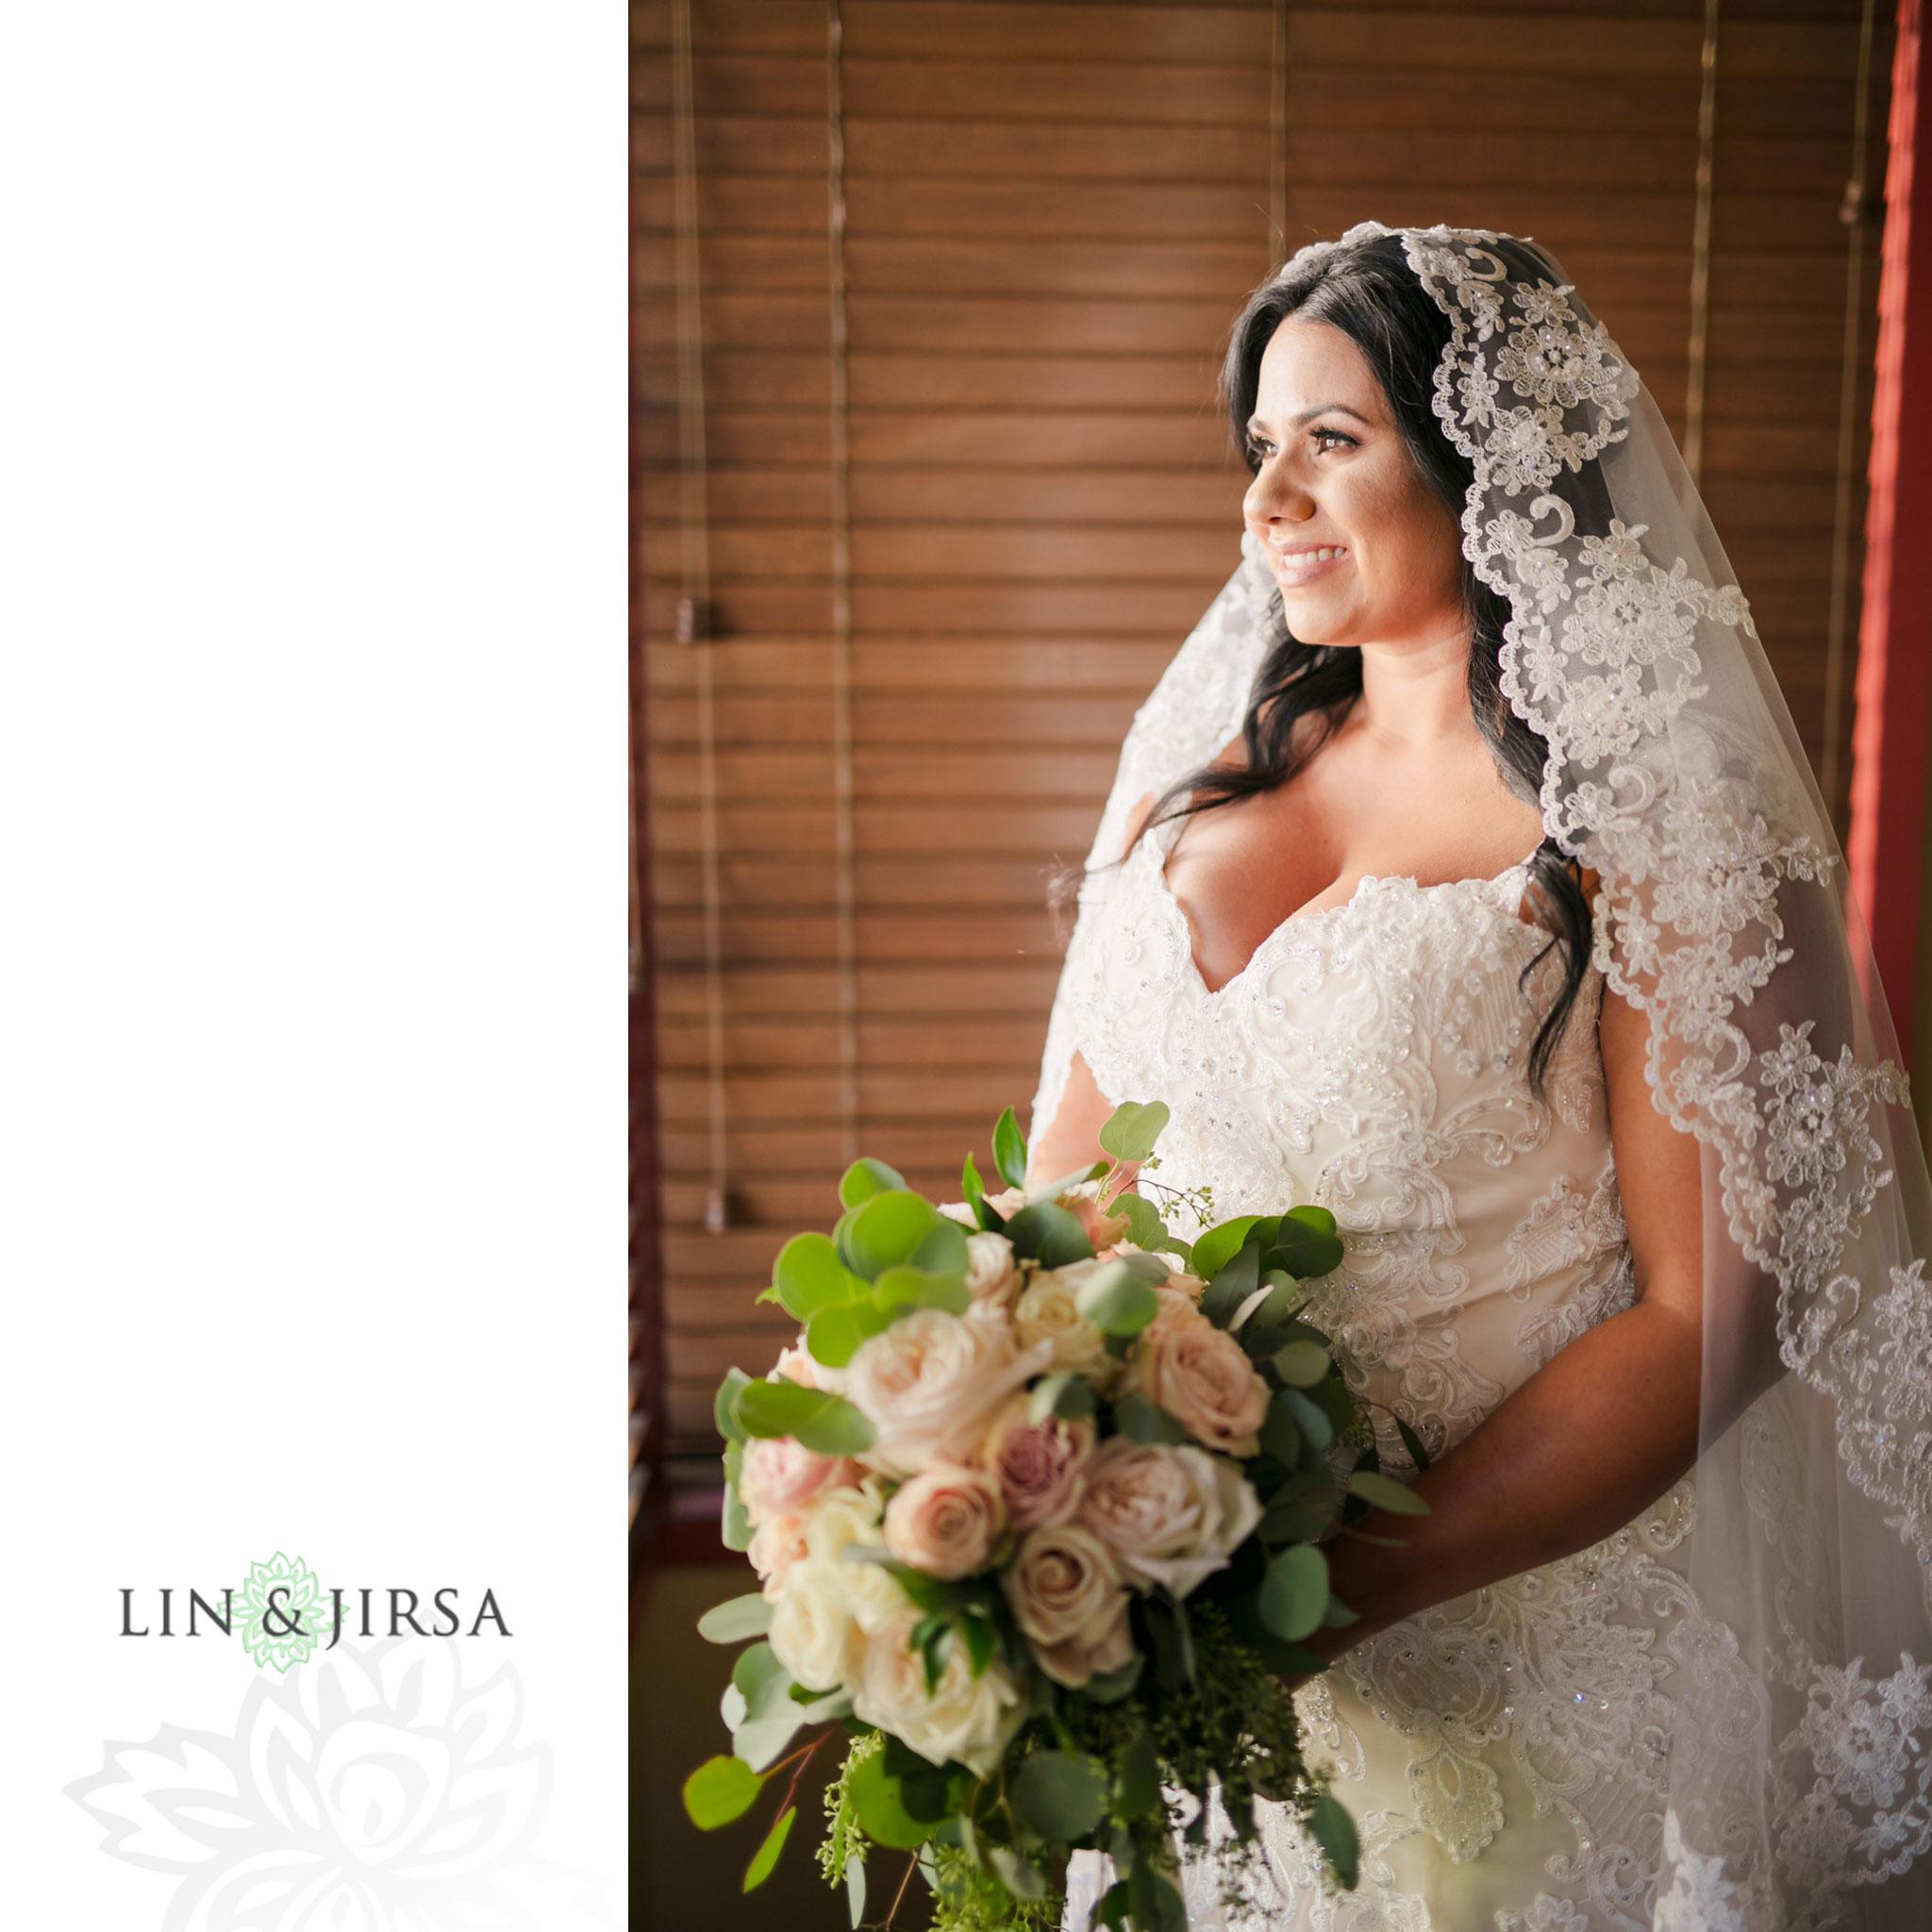 005 padua hills claremont bride wedding photography